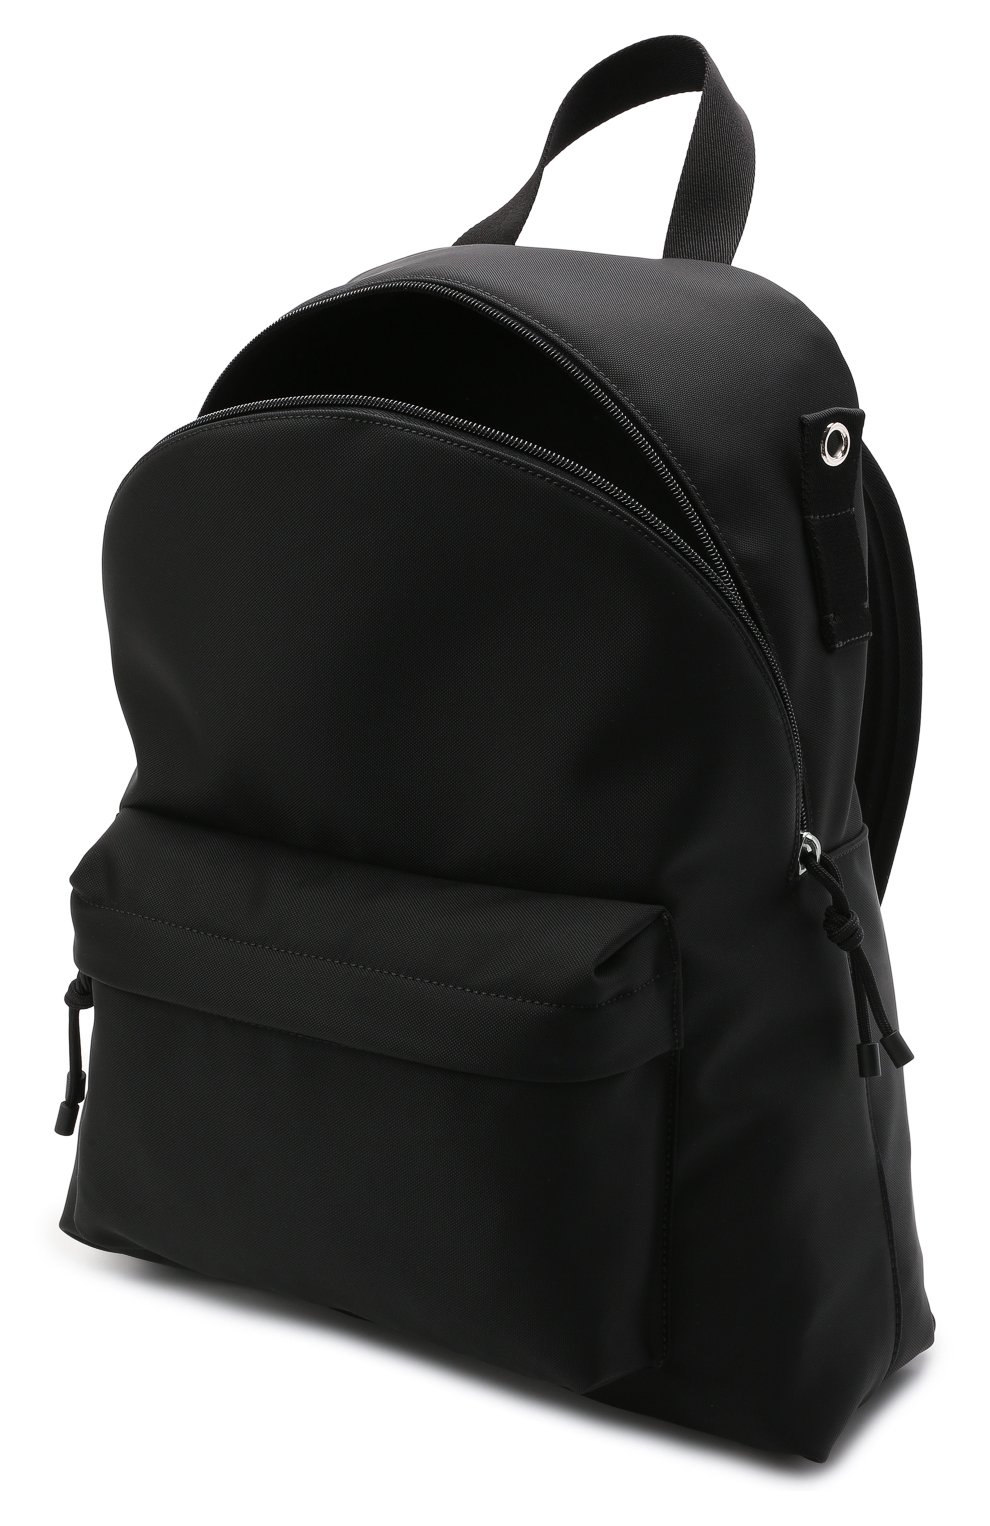 Мужской текстильный рюкзак VALENTINO черного цвета, арт. WY2B0A98/HQH | Фото 4 (Ремень/цепочка: На ремешке; Материал: Текстиль)